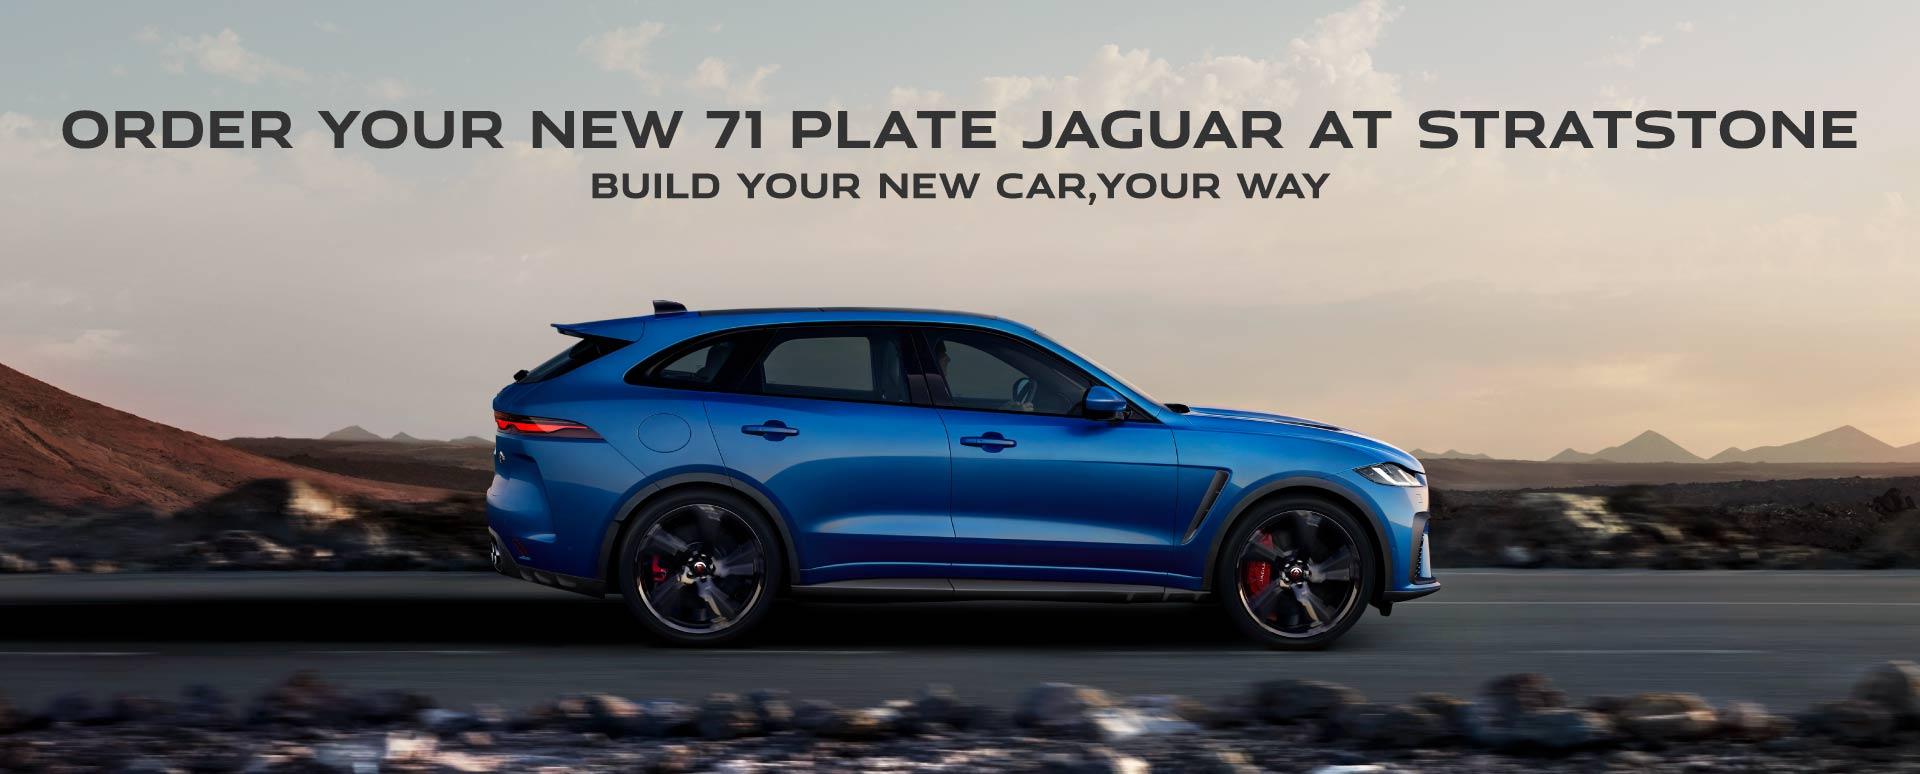 Jaguar 71 Plate